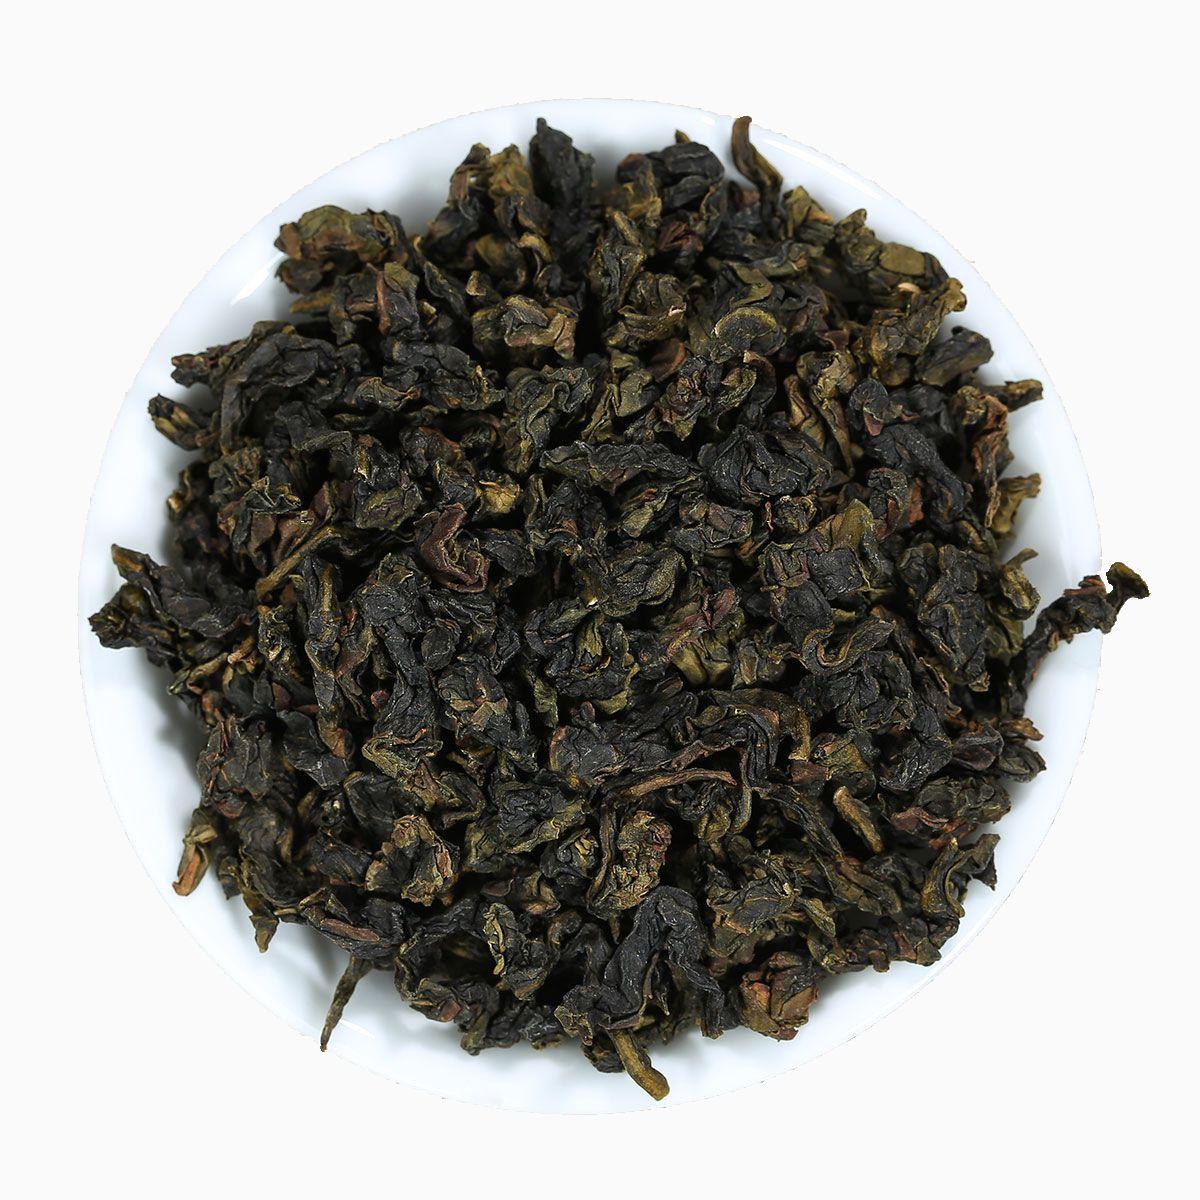 Tieguanyin Aroma oolong tea iron goddess - 4uTea | 4uTea.com